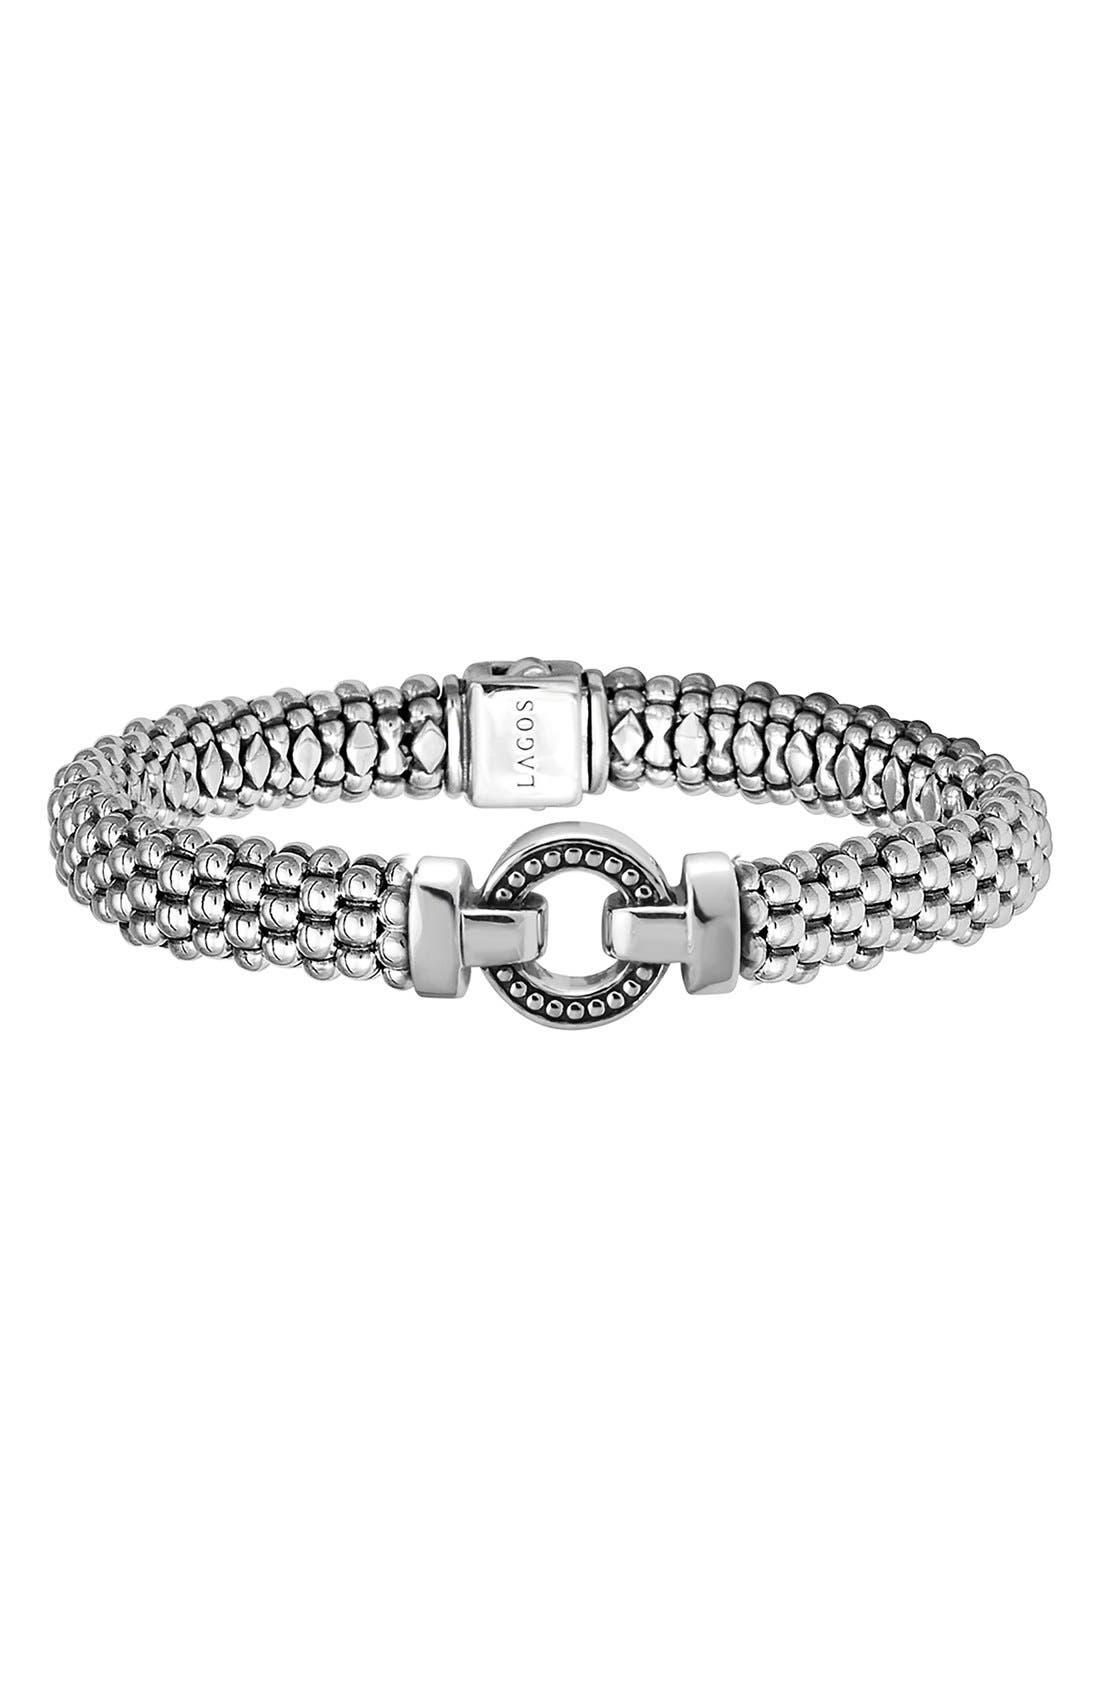 Alternate Image 1 Selected - LAGOS 'Enso' Caviar™ Rope Bracelet